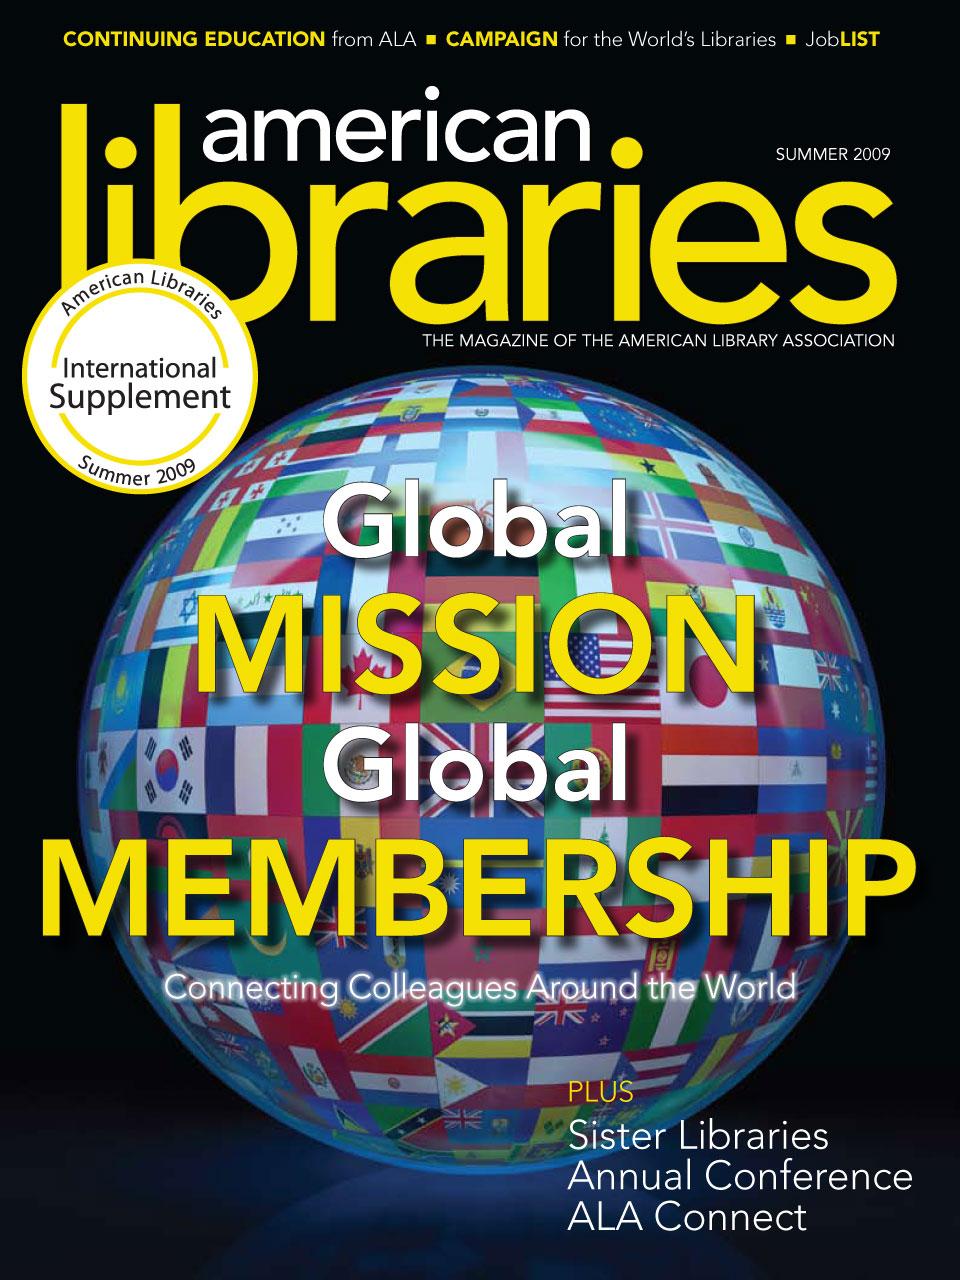 International Supplement 2009